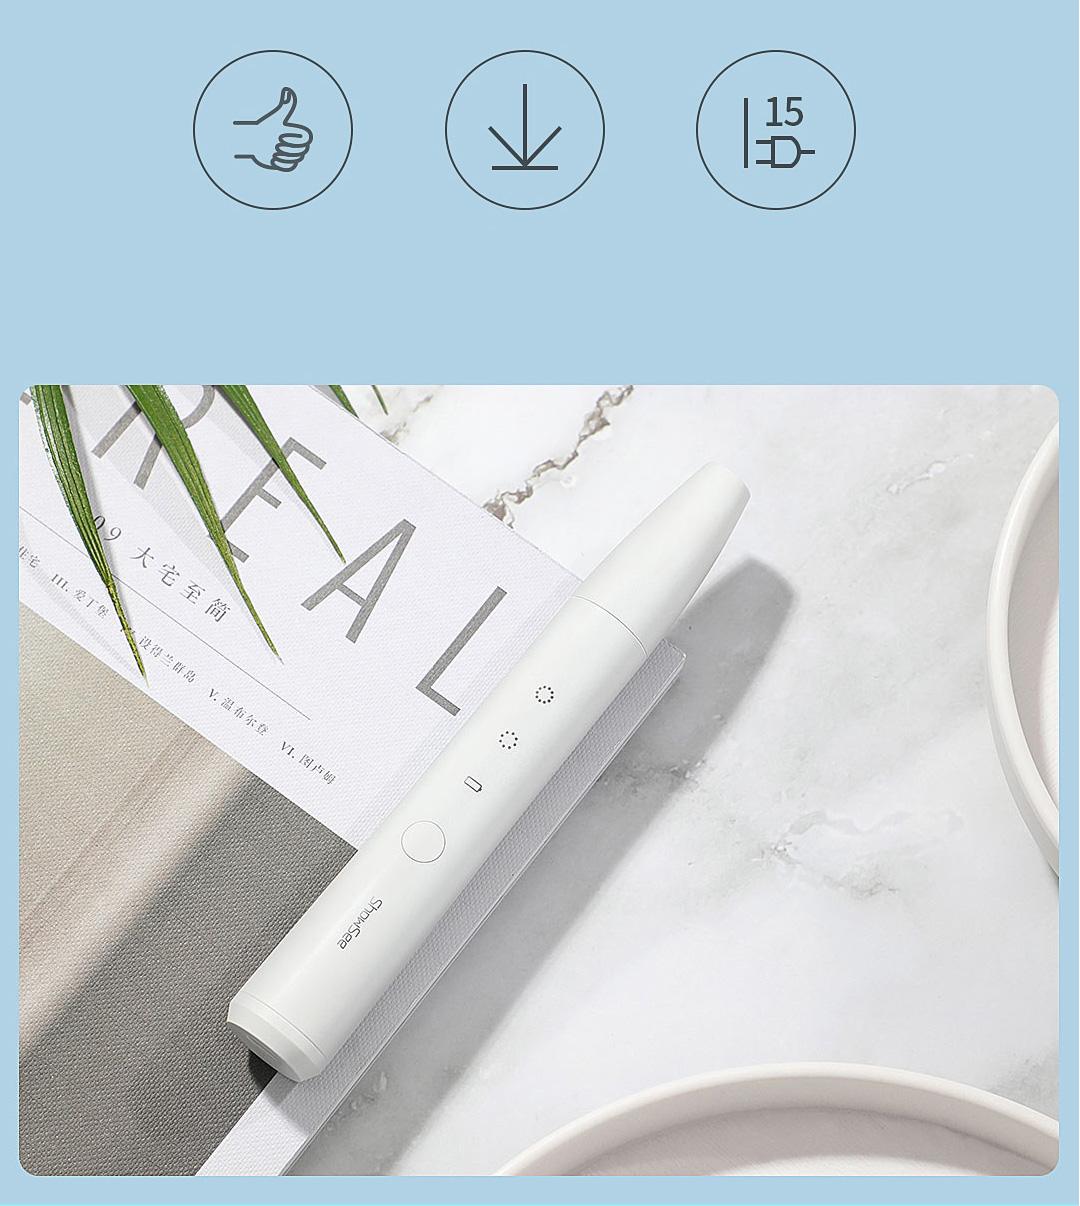 Xiaomi ShowSee Electric Nail Buffer